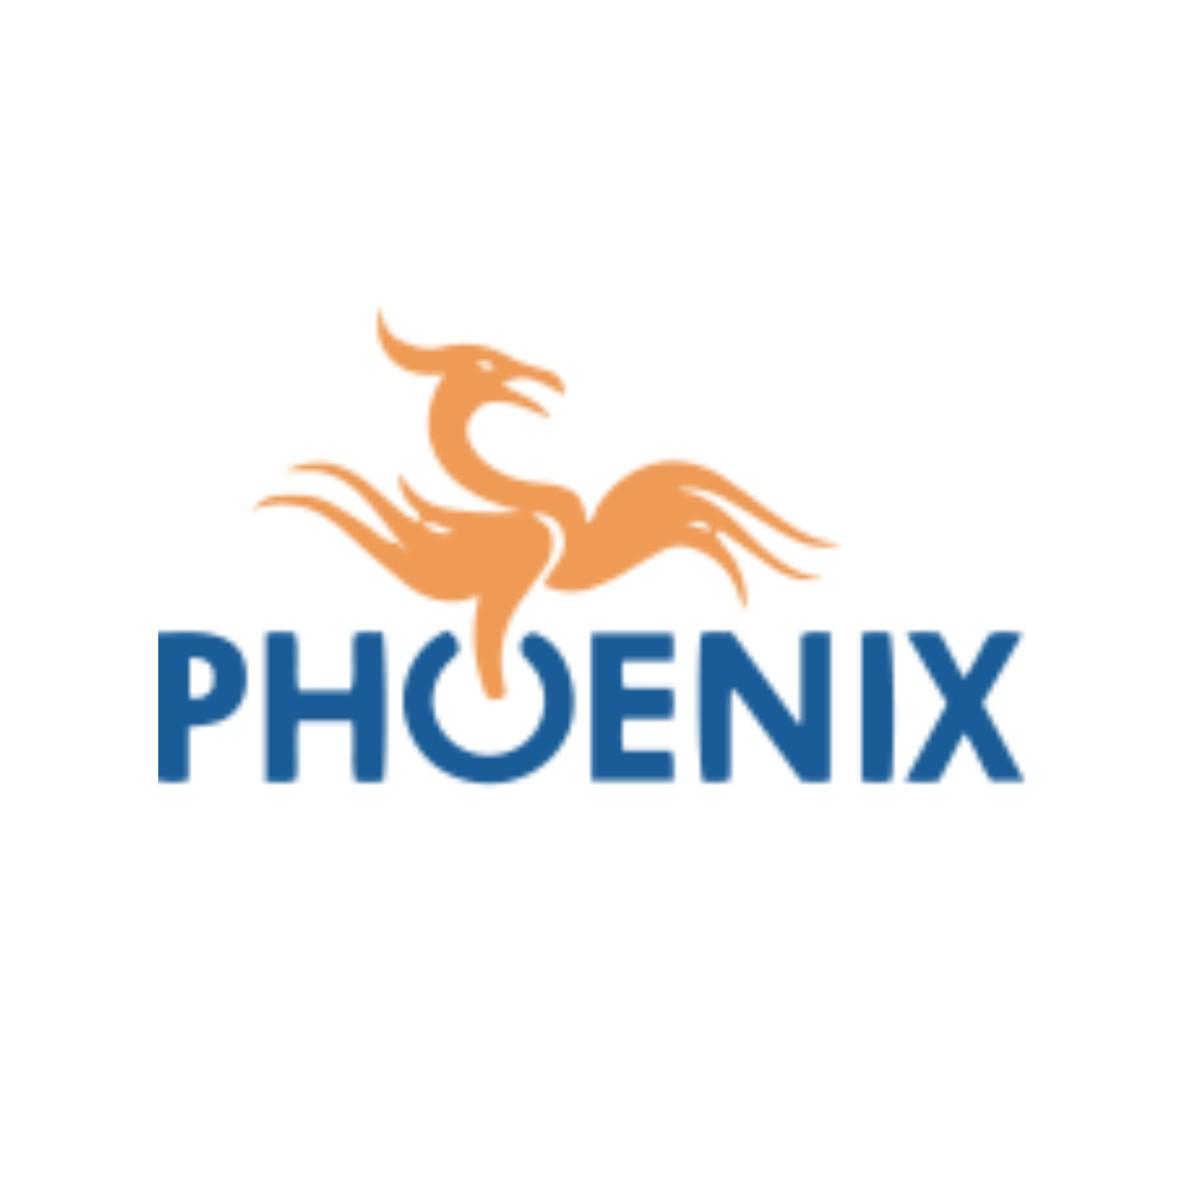 Phoenix Computing Strategies image 3